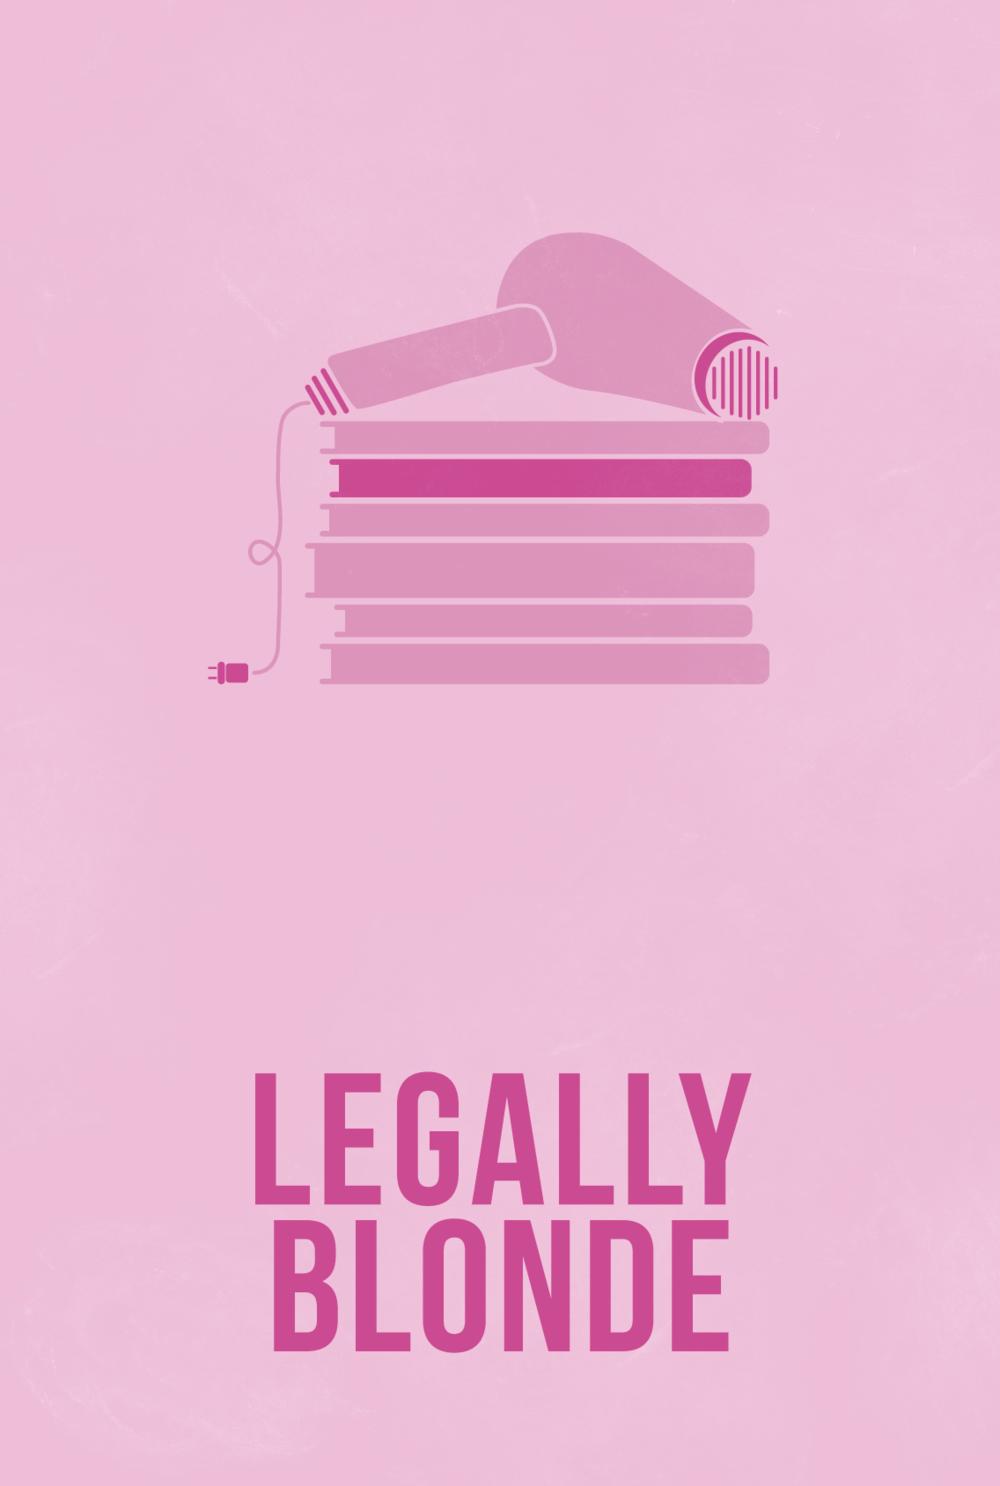 legallyblondevertical